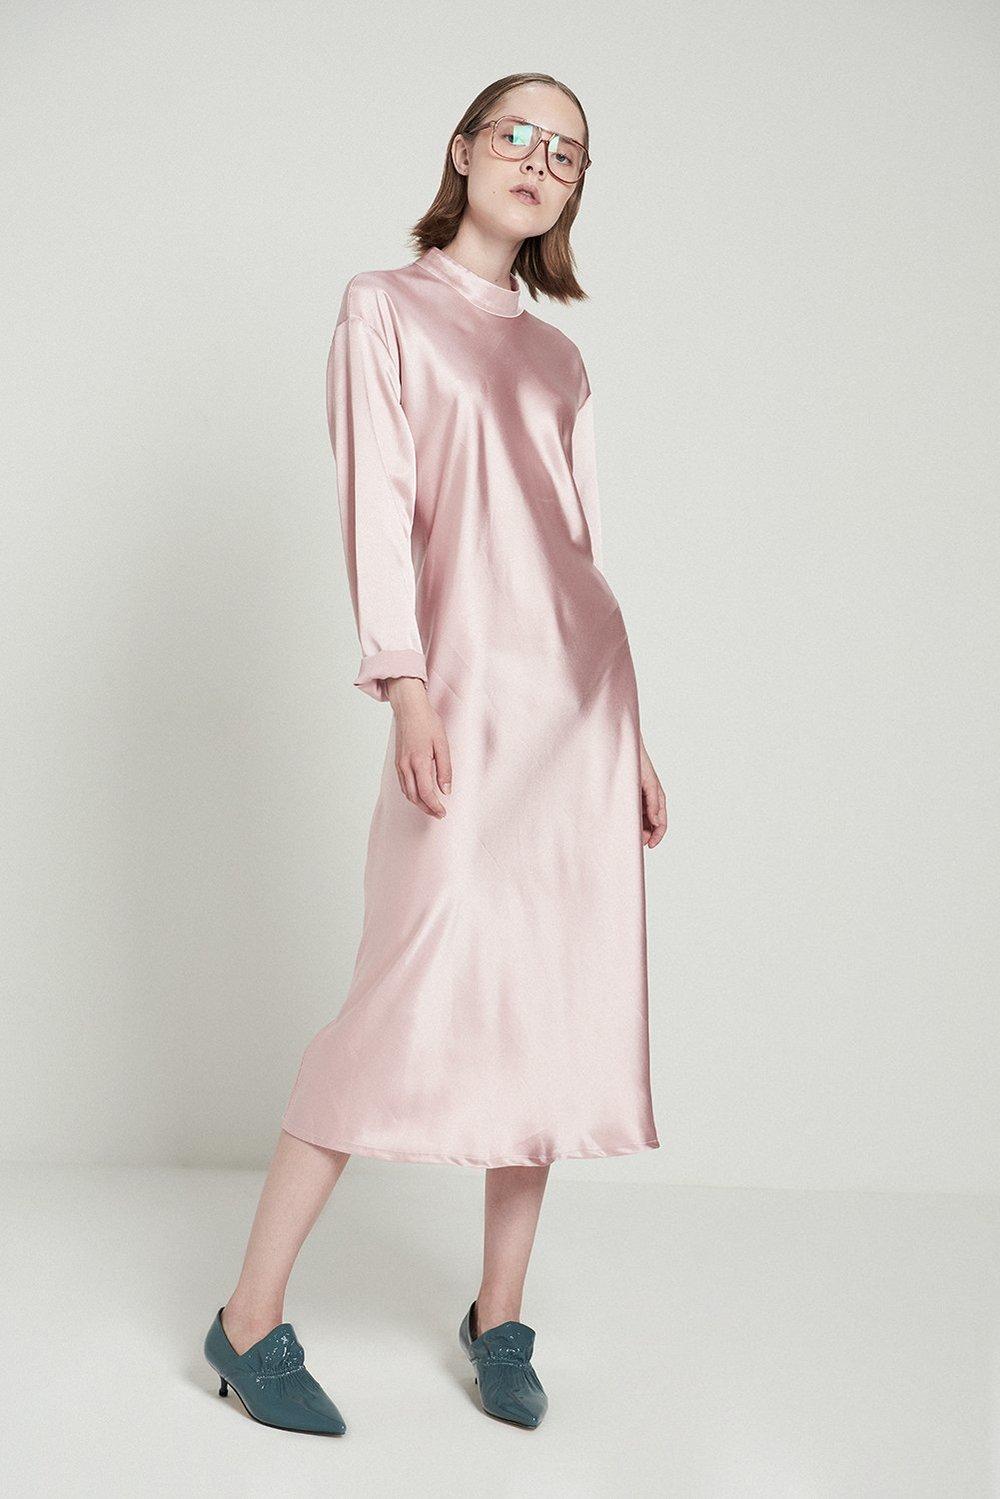 Shiny Turtleneck A-line Dress-Pink, $95